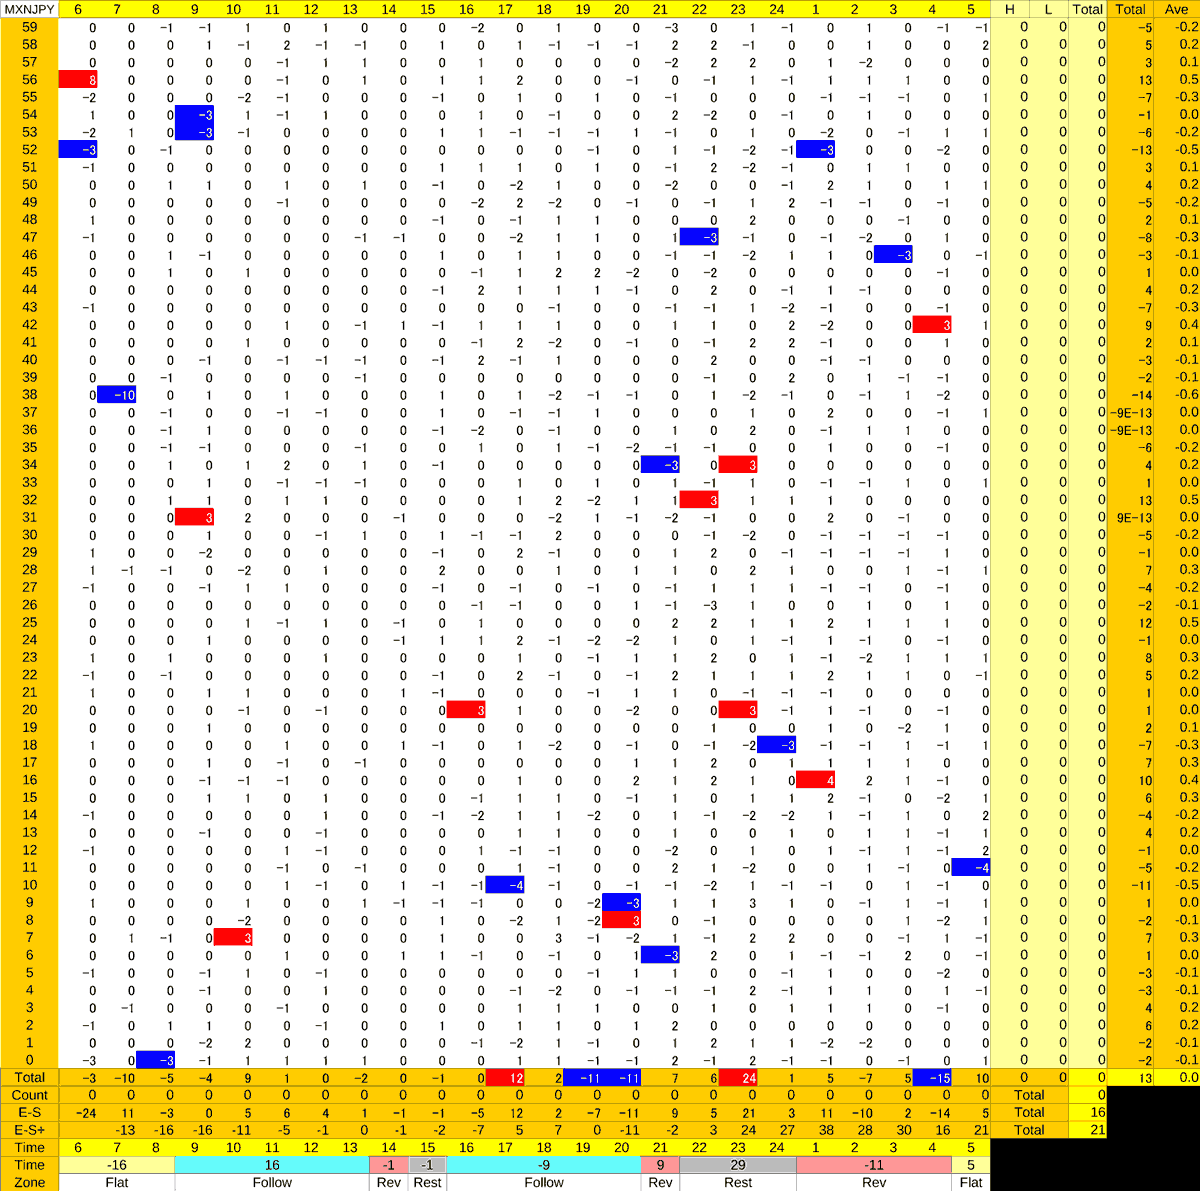 20201208_HS(3)MXNJPY